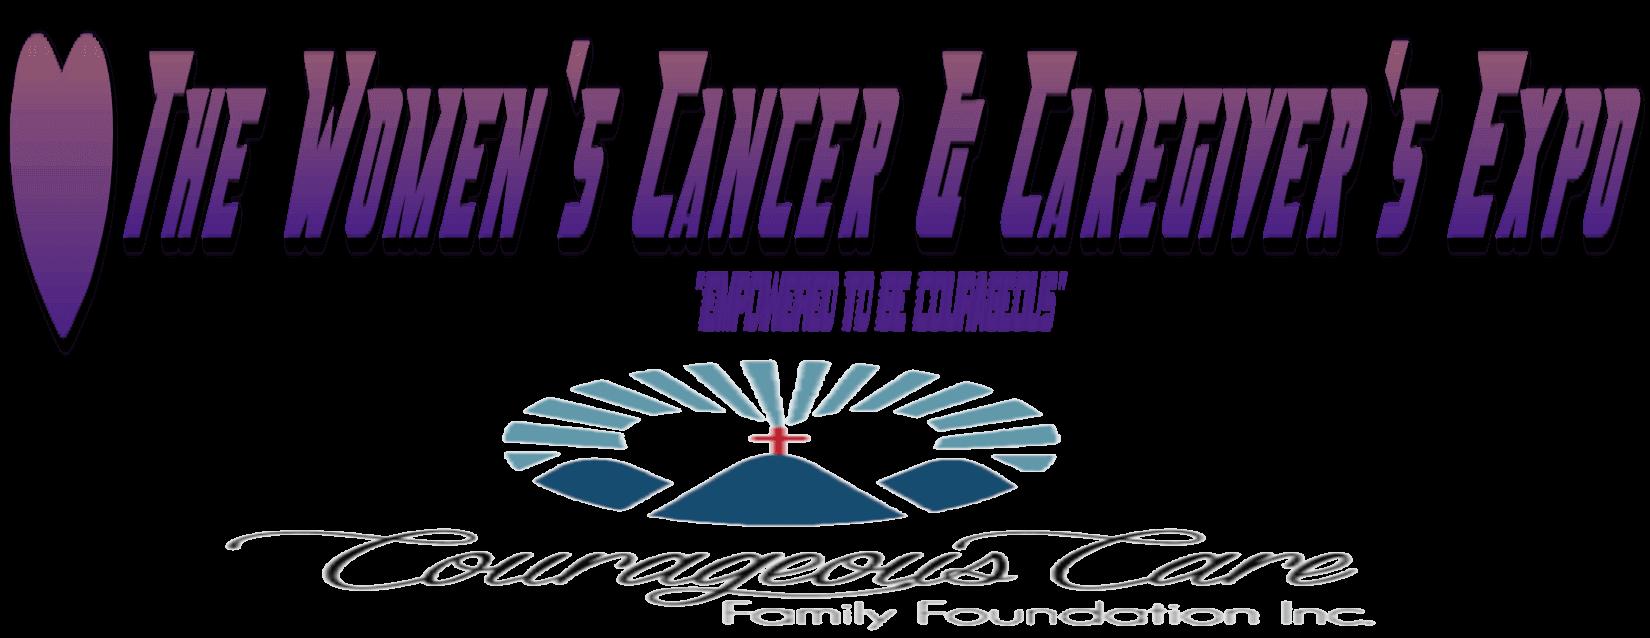 for Cancer adult foundation